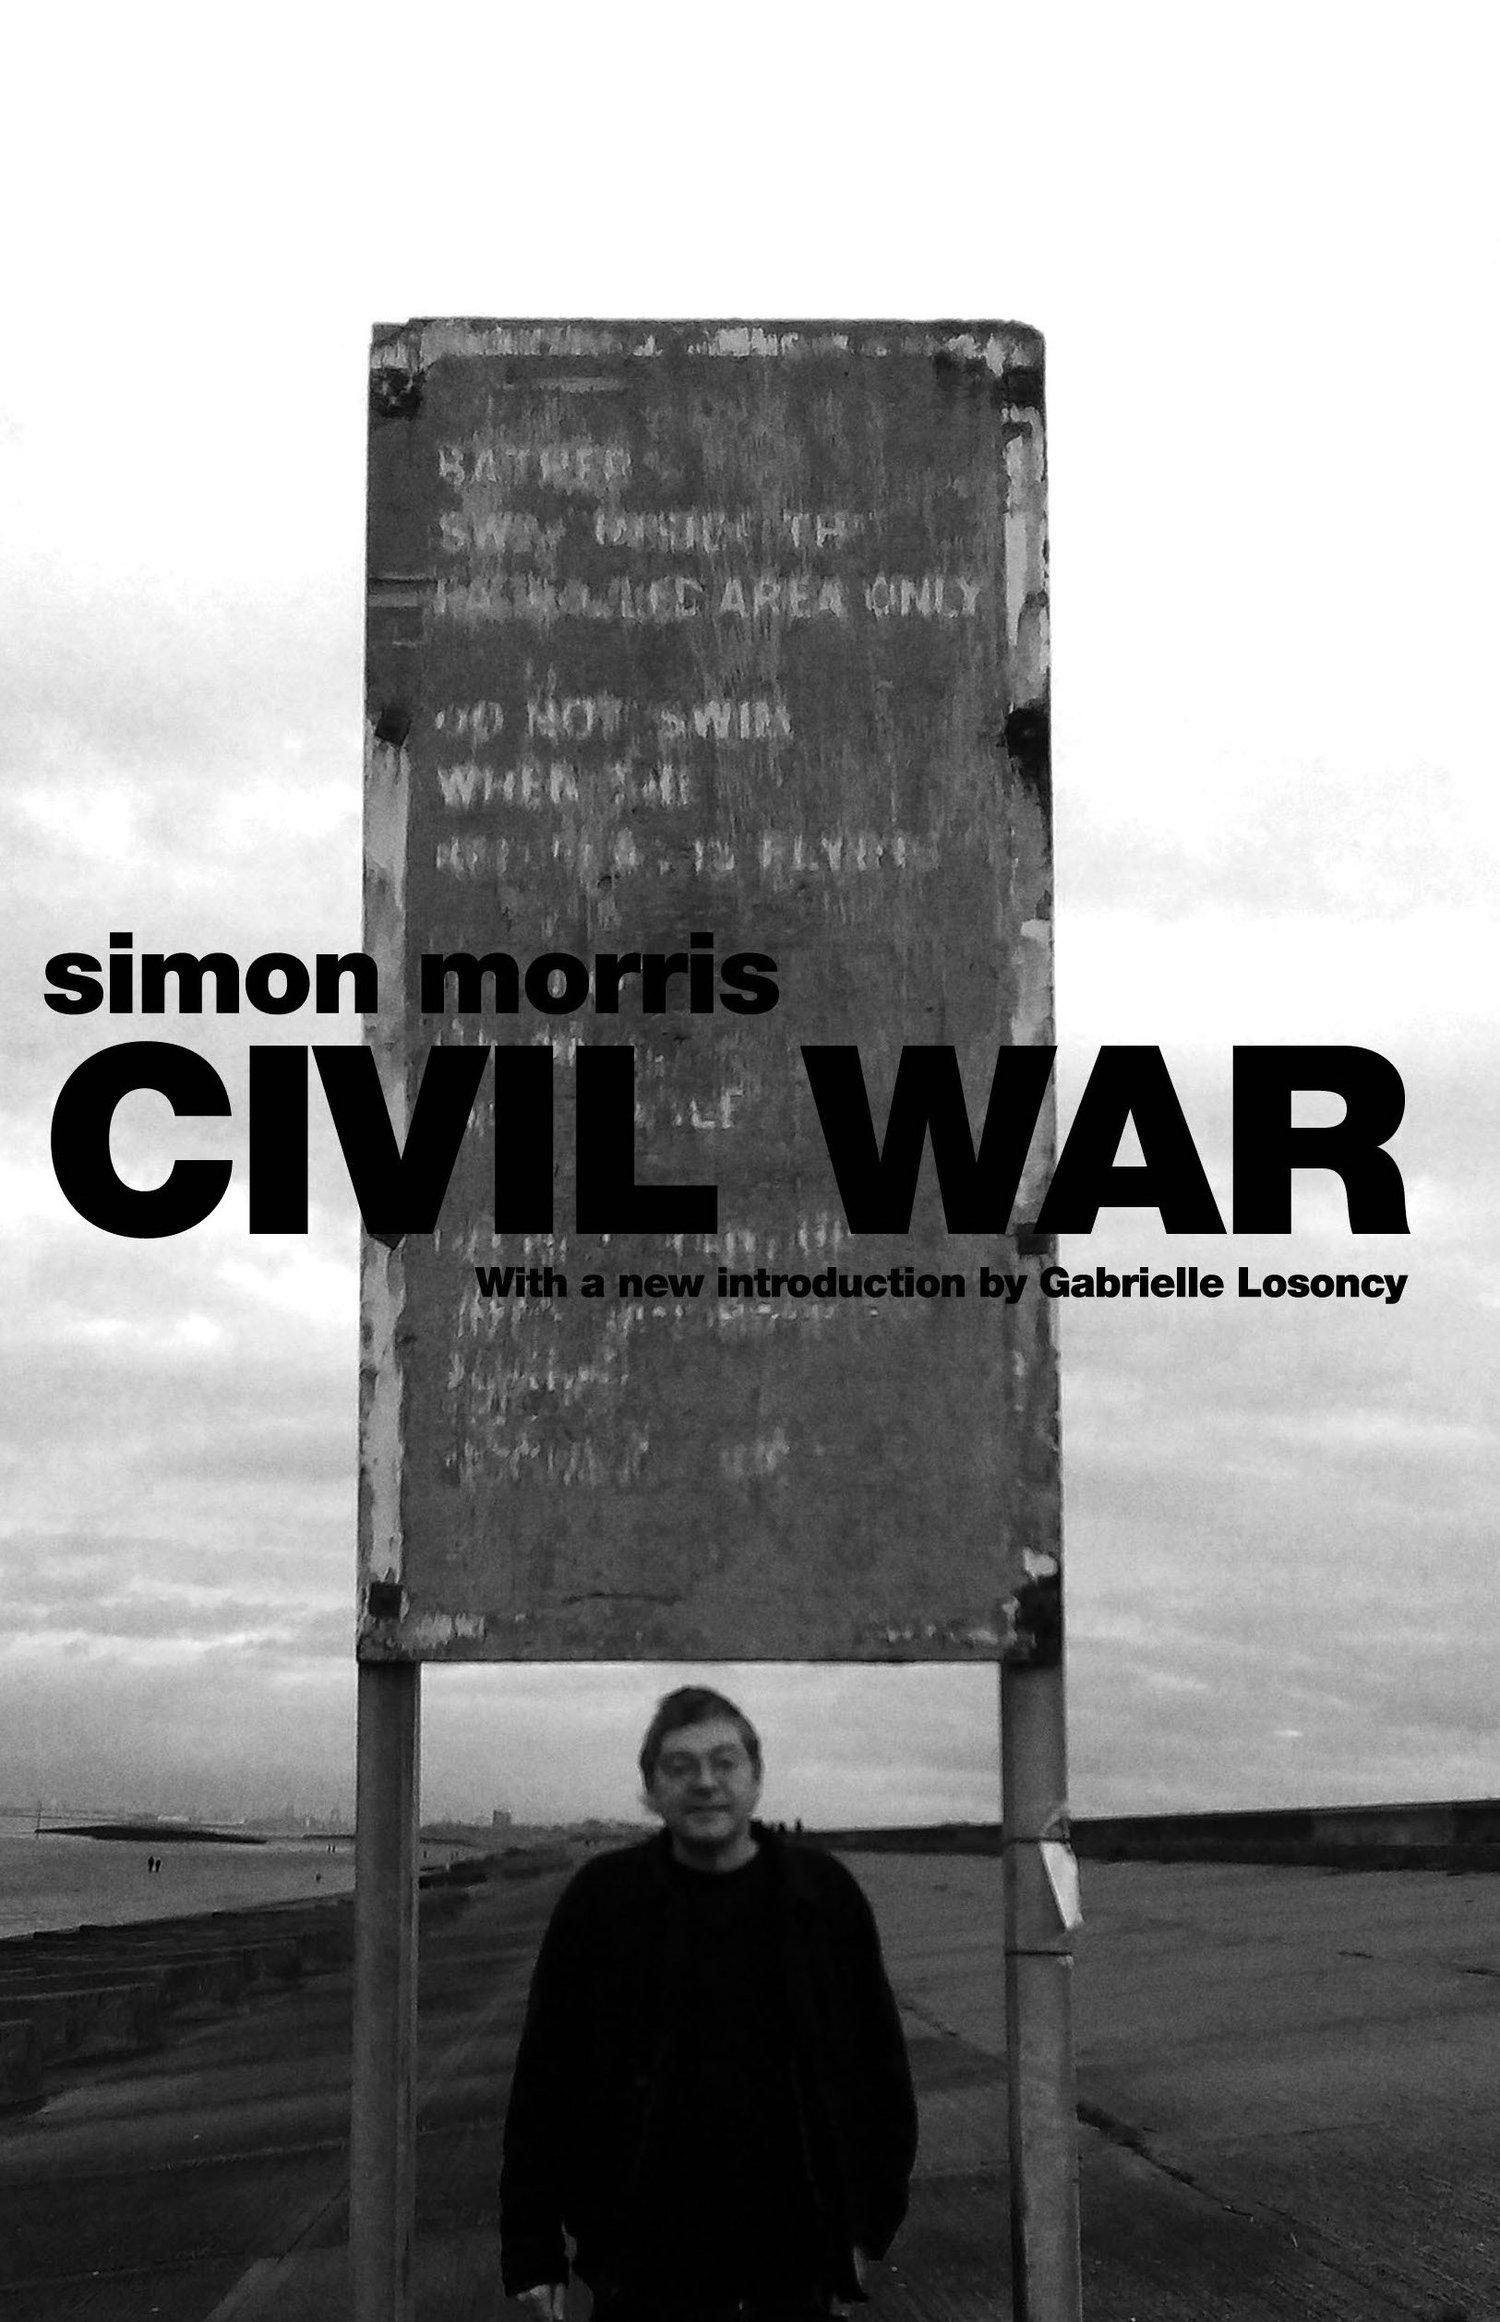 Image of <b>CIVIL WAR Special Edition</b> Simon Morris